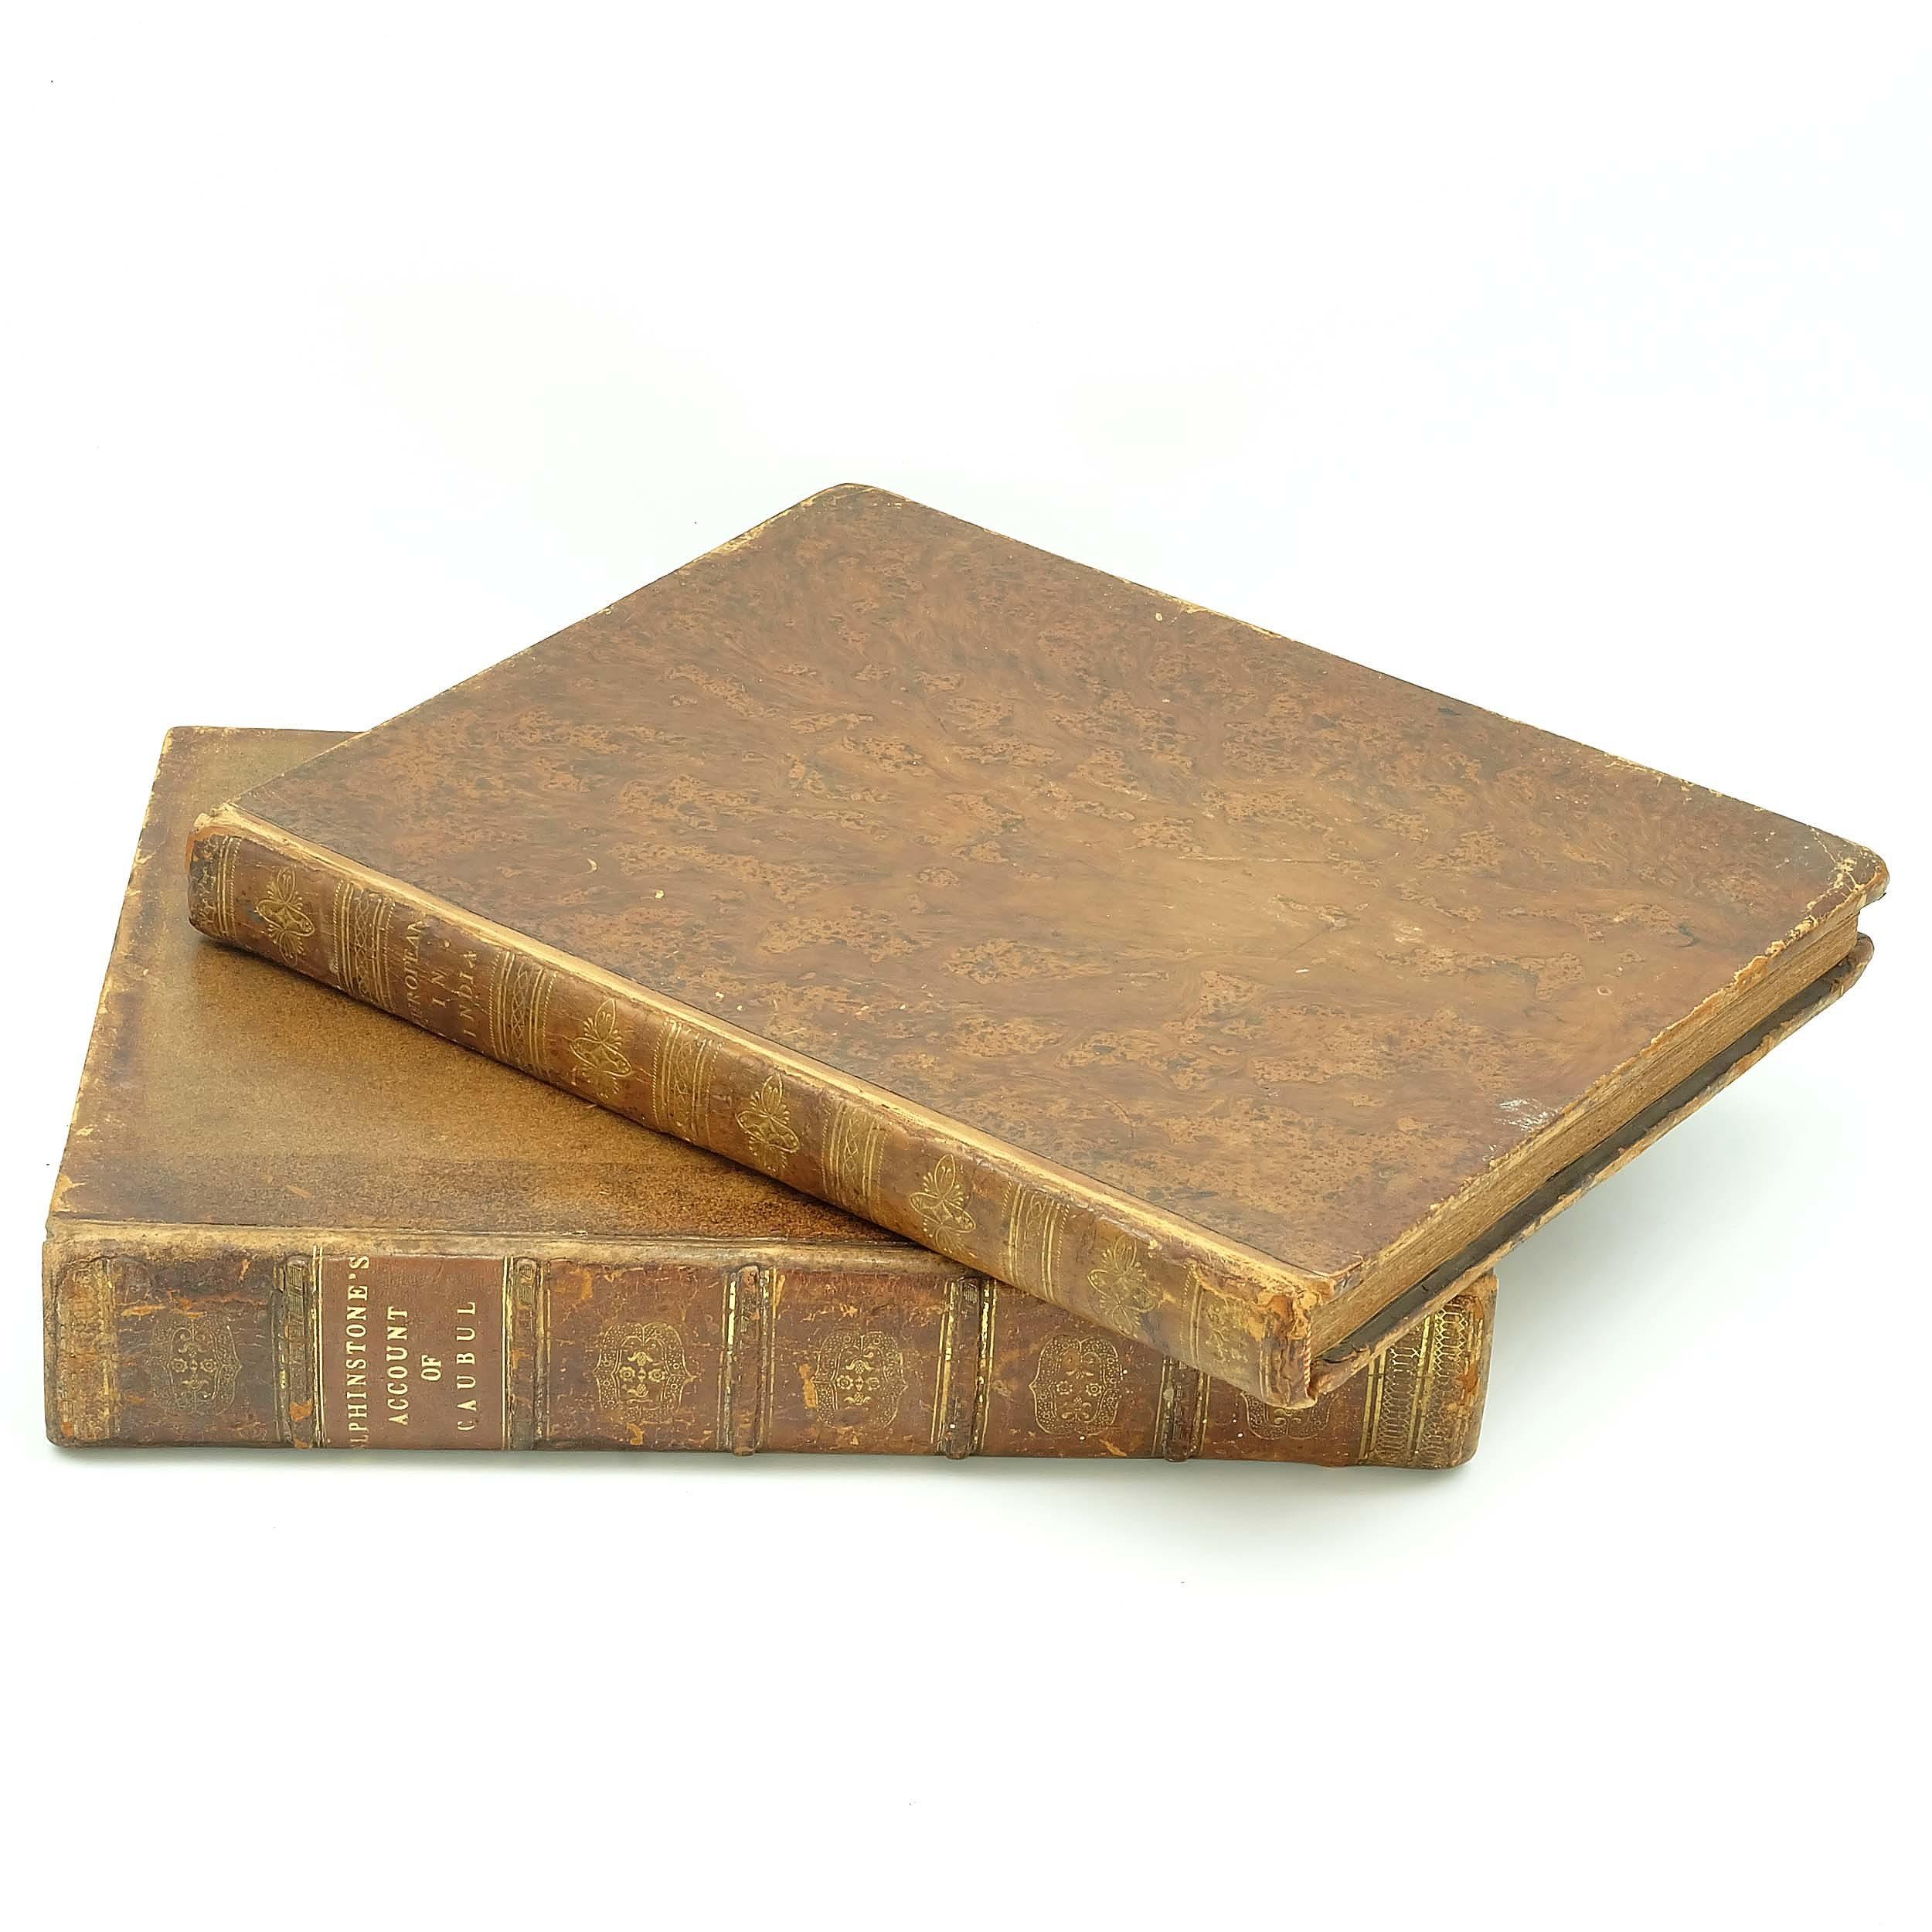 'Mountstuart Elphinstone An Account of the Kingdom of Caubul, 1815 and Captain Thomas Williamson, The European in India 1813'